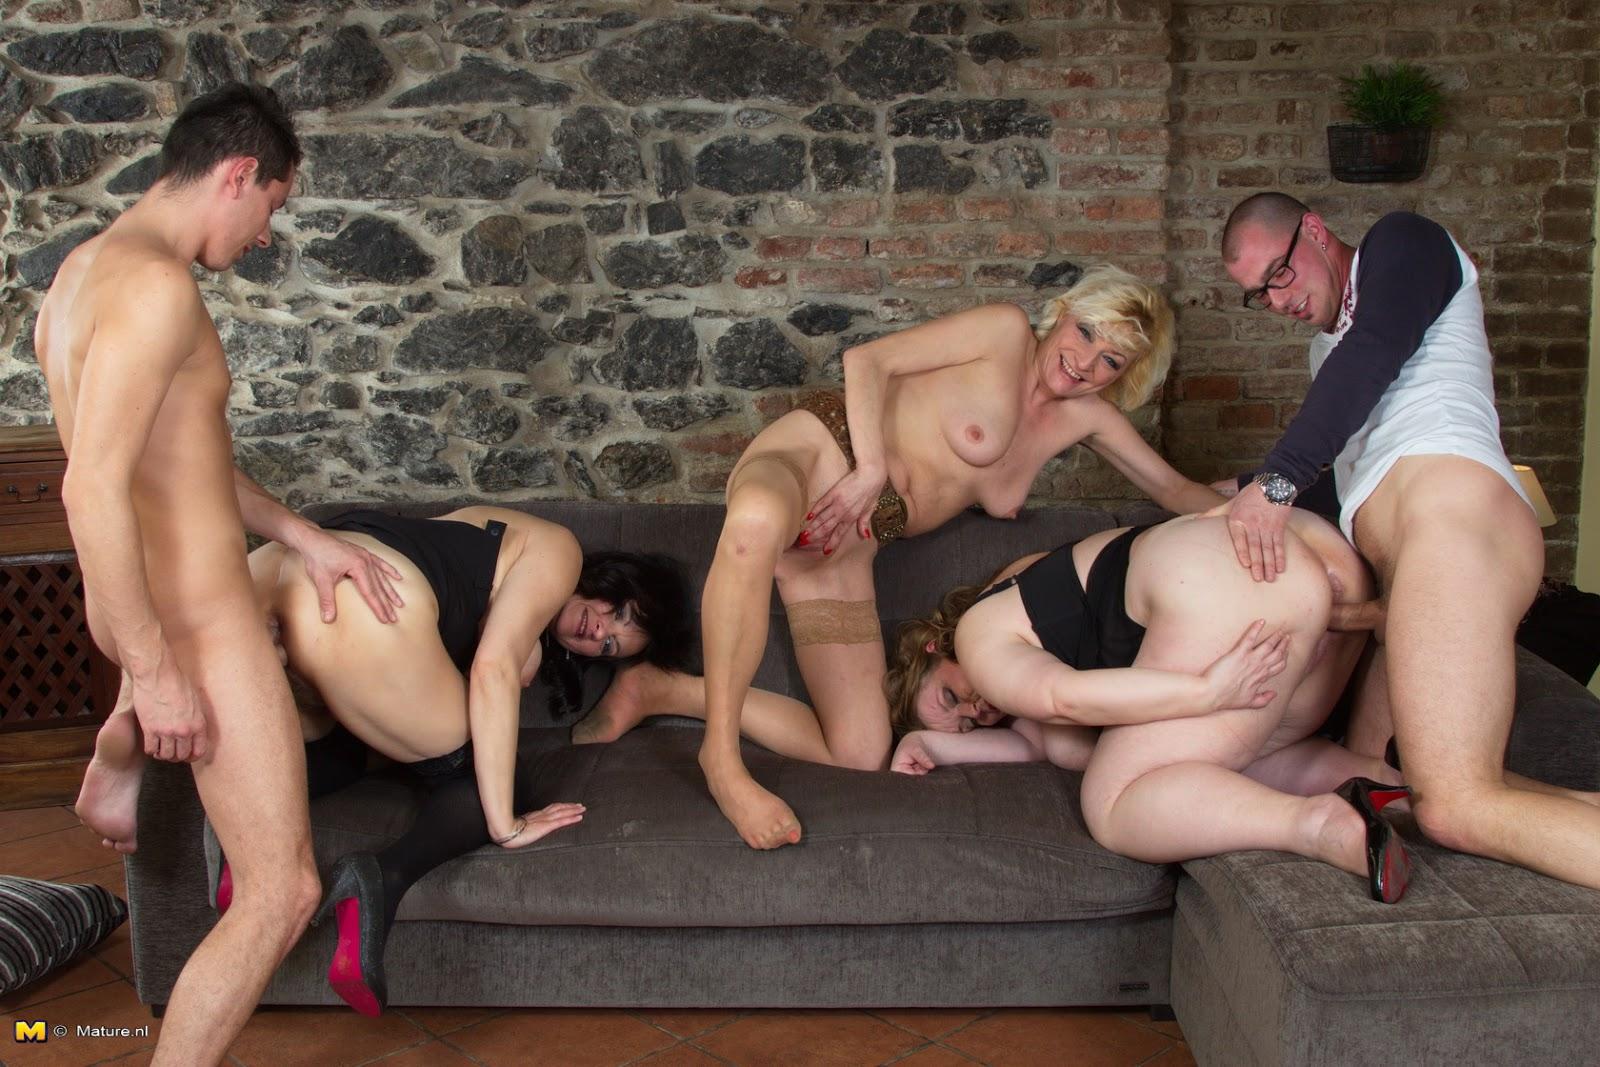 Women group nude Nude Hotel